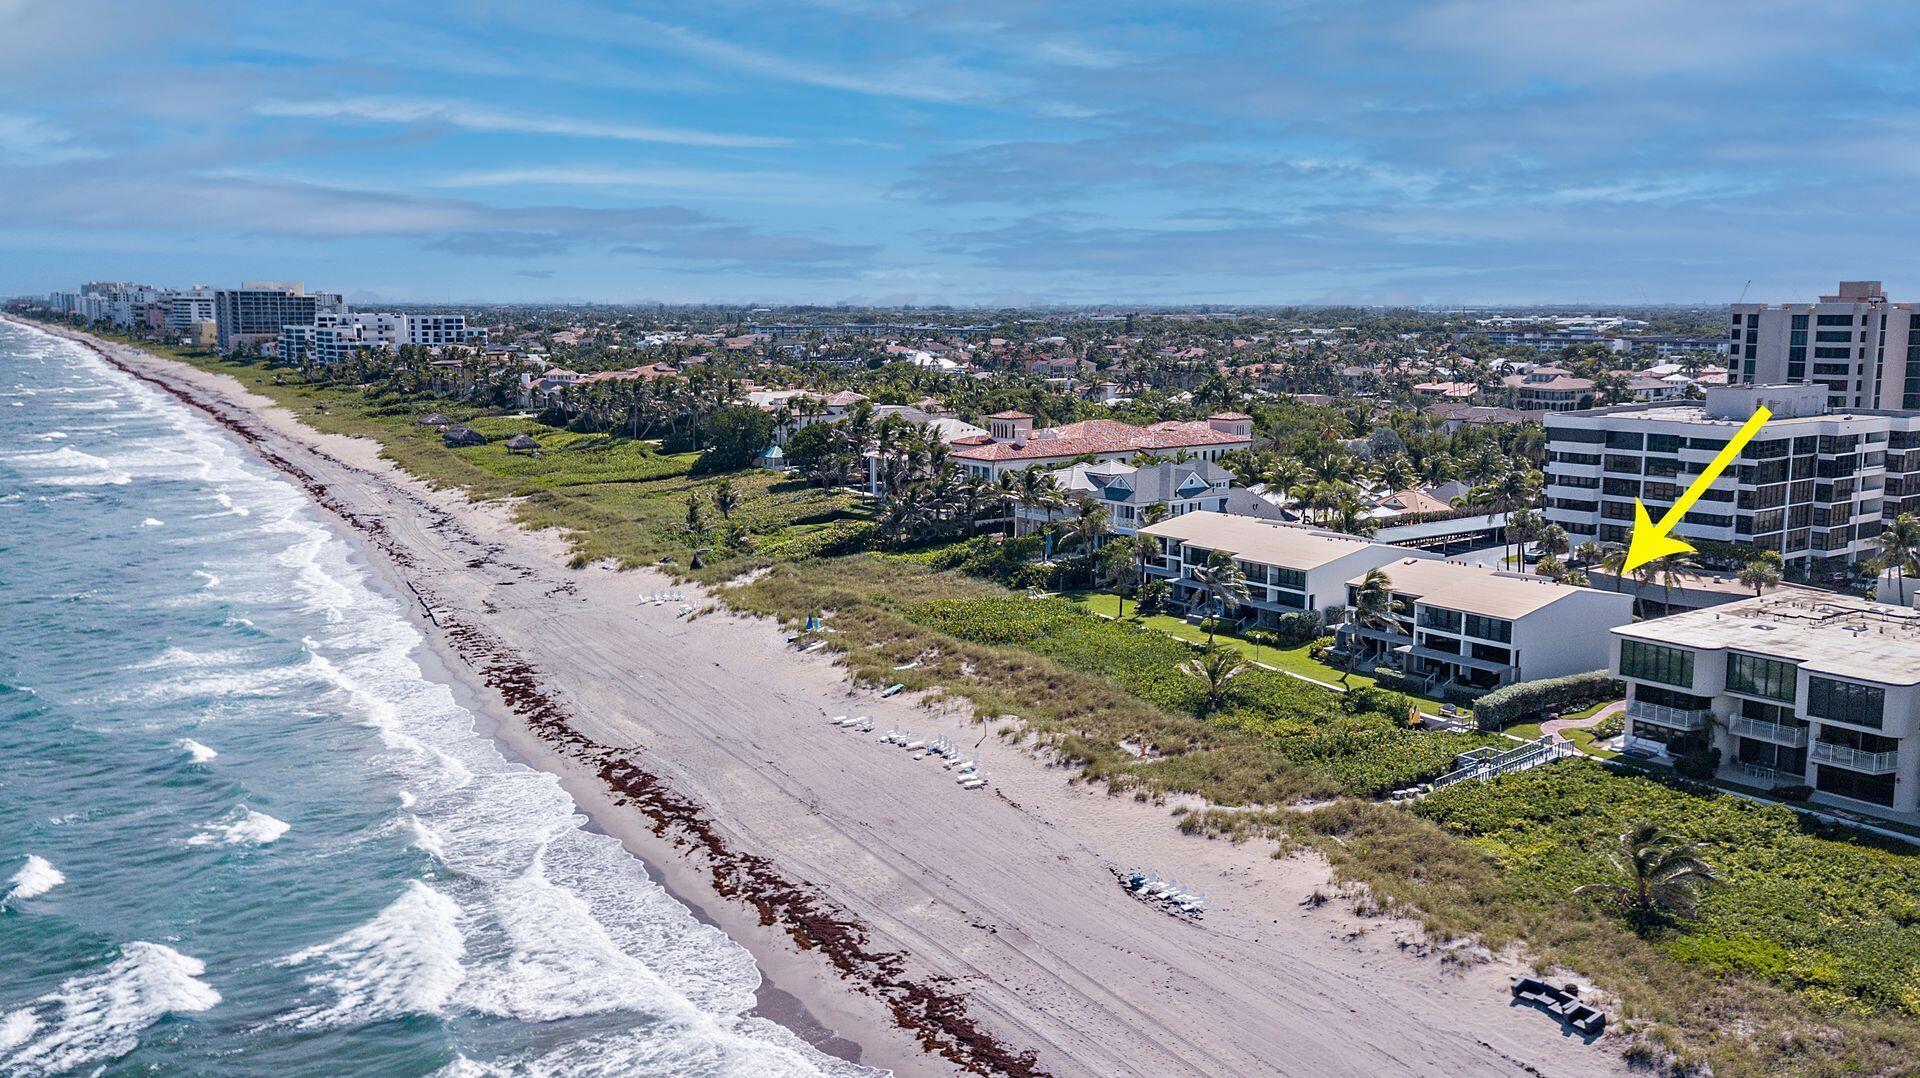 2175 S Ocean Boulevard, Th-9, Delray Beach, FL 33483